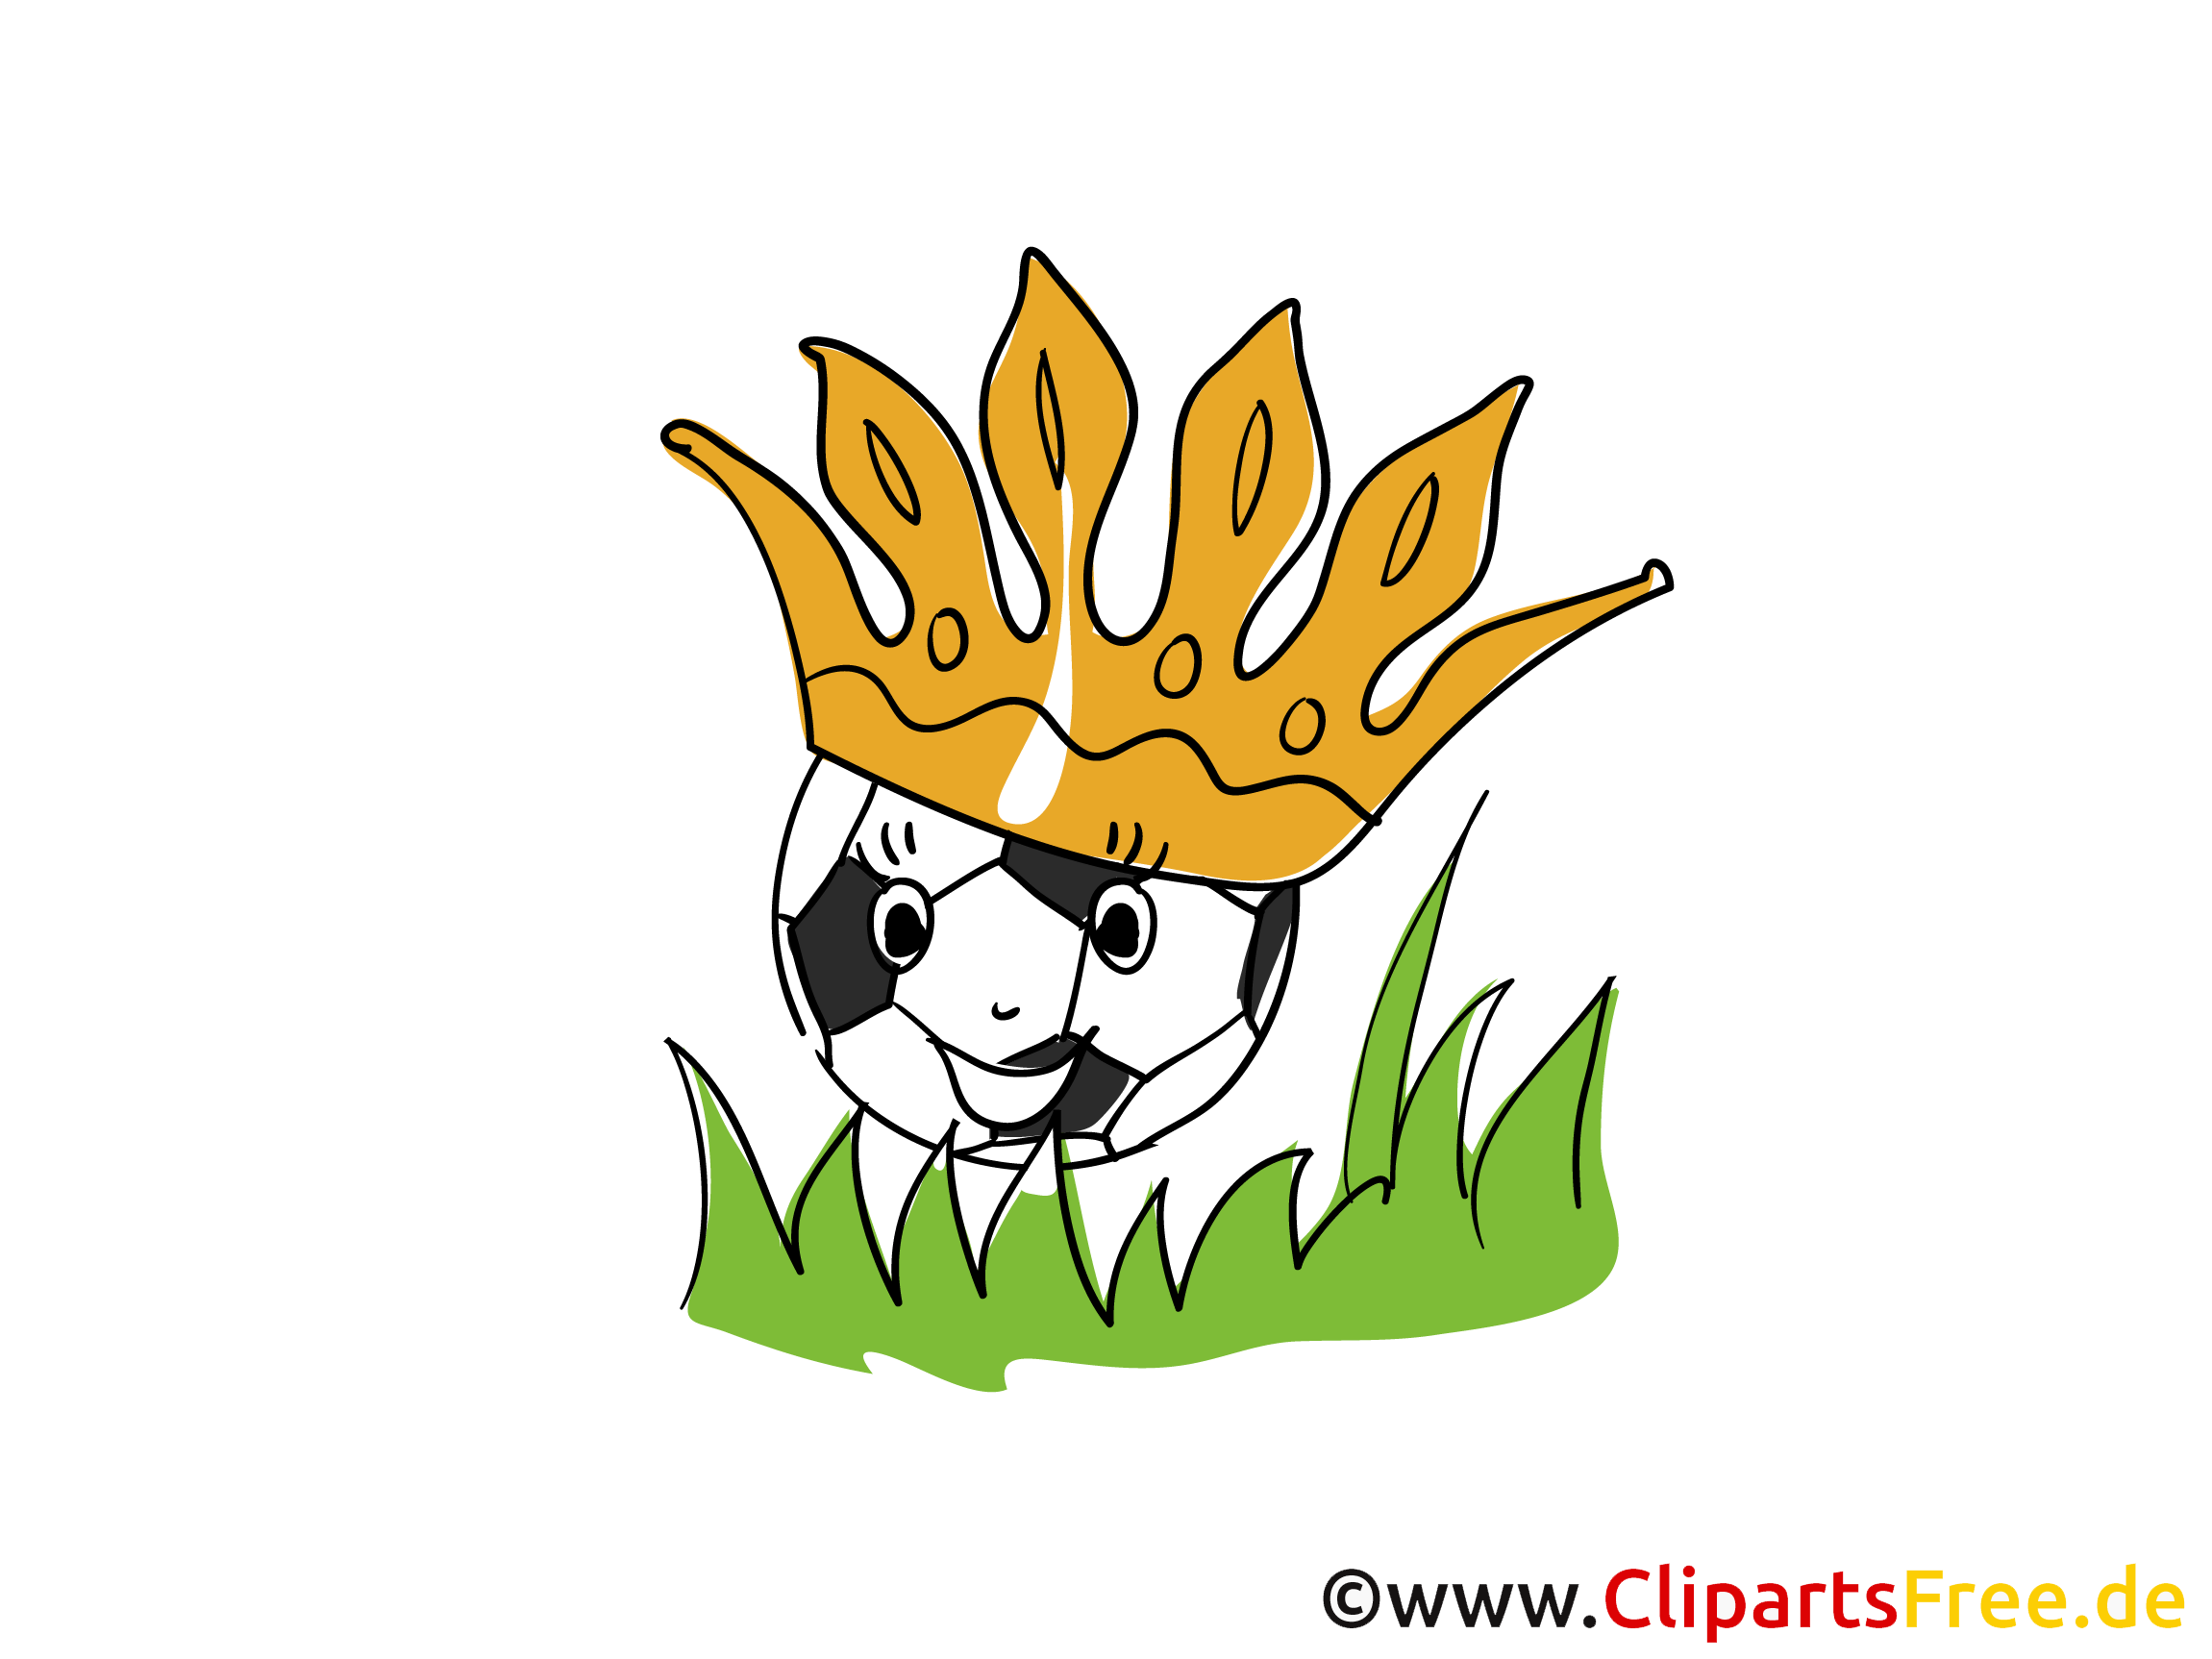 Fussball-Krone Clipart-Bild